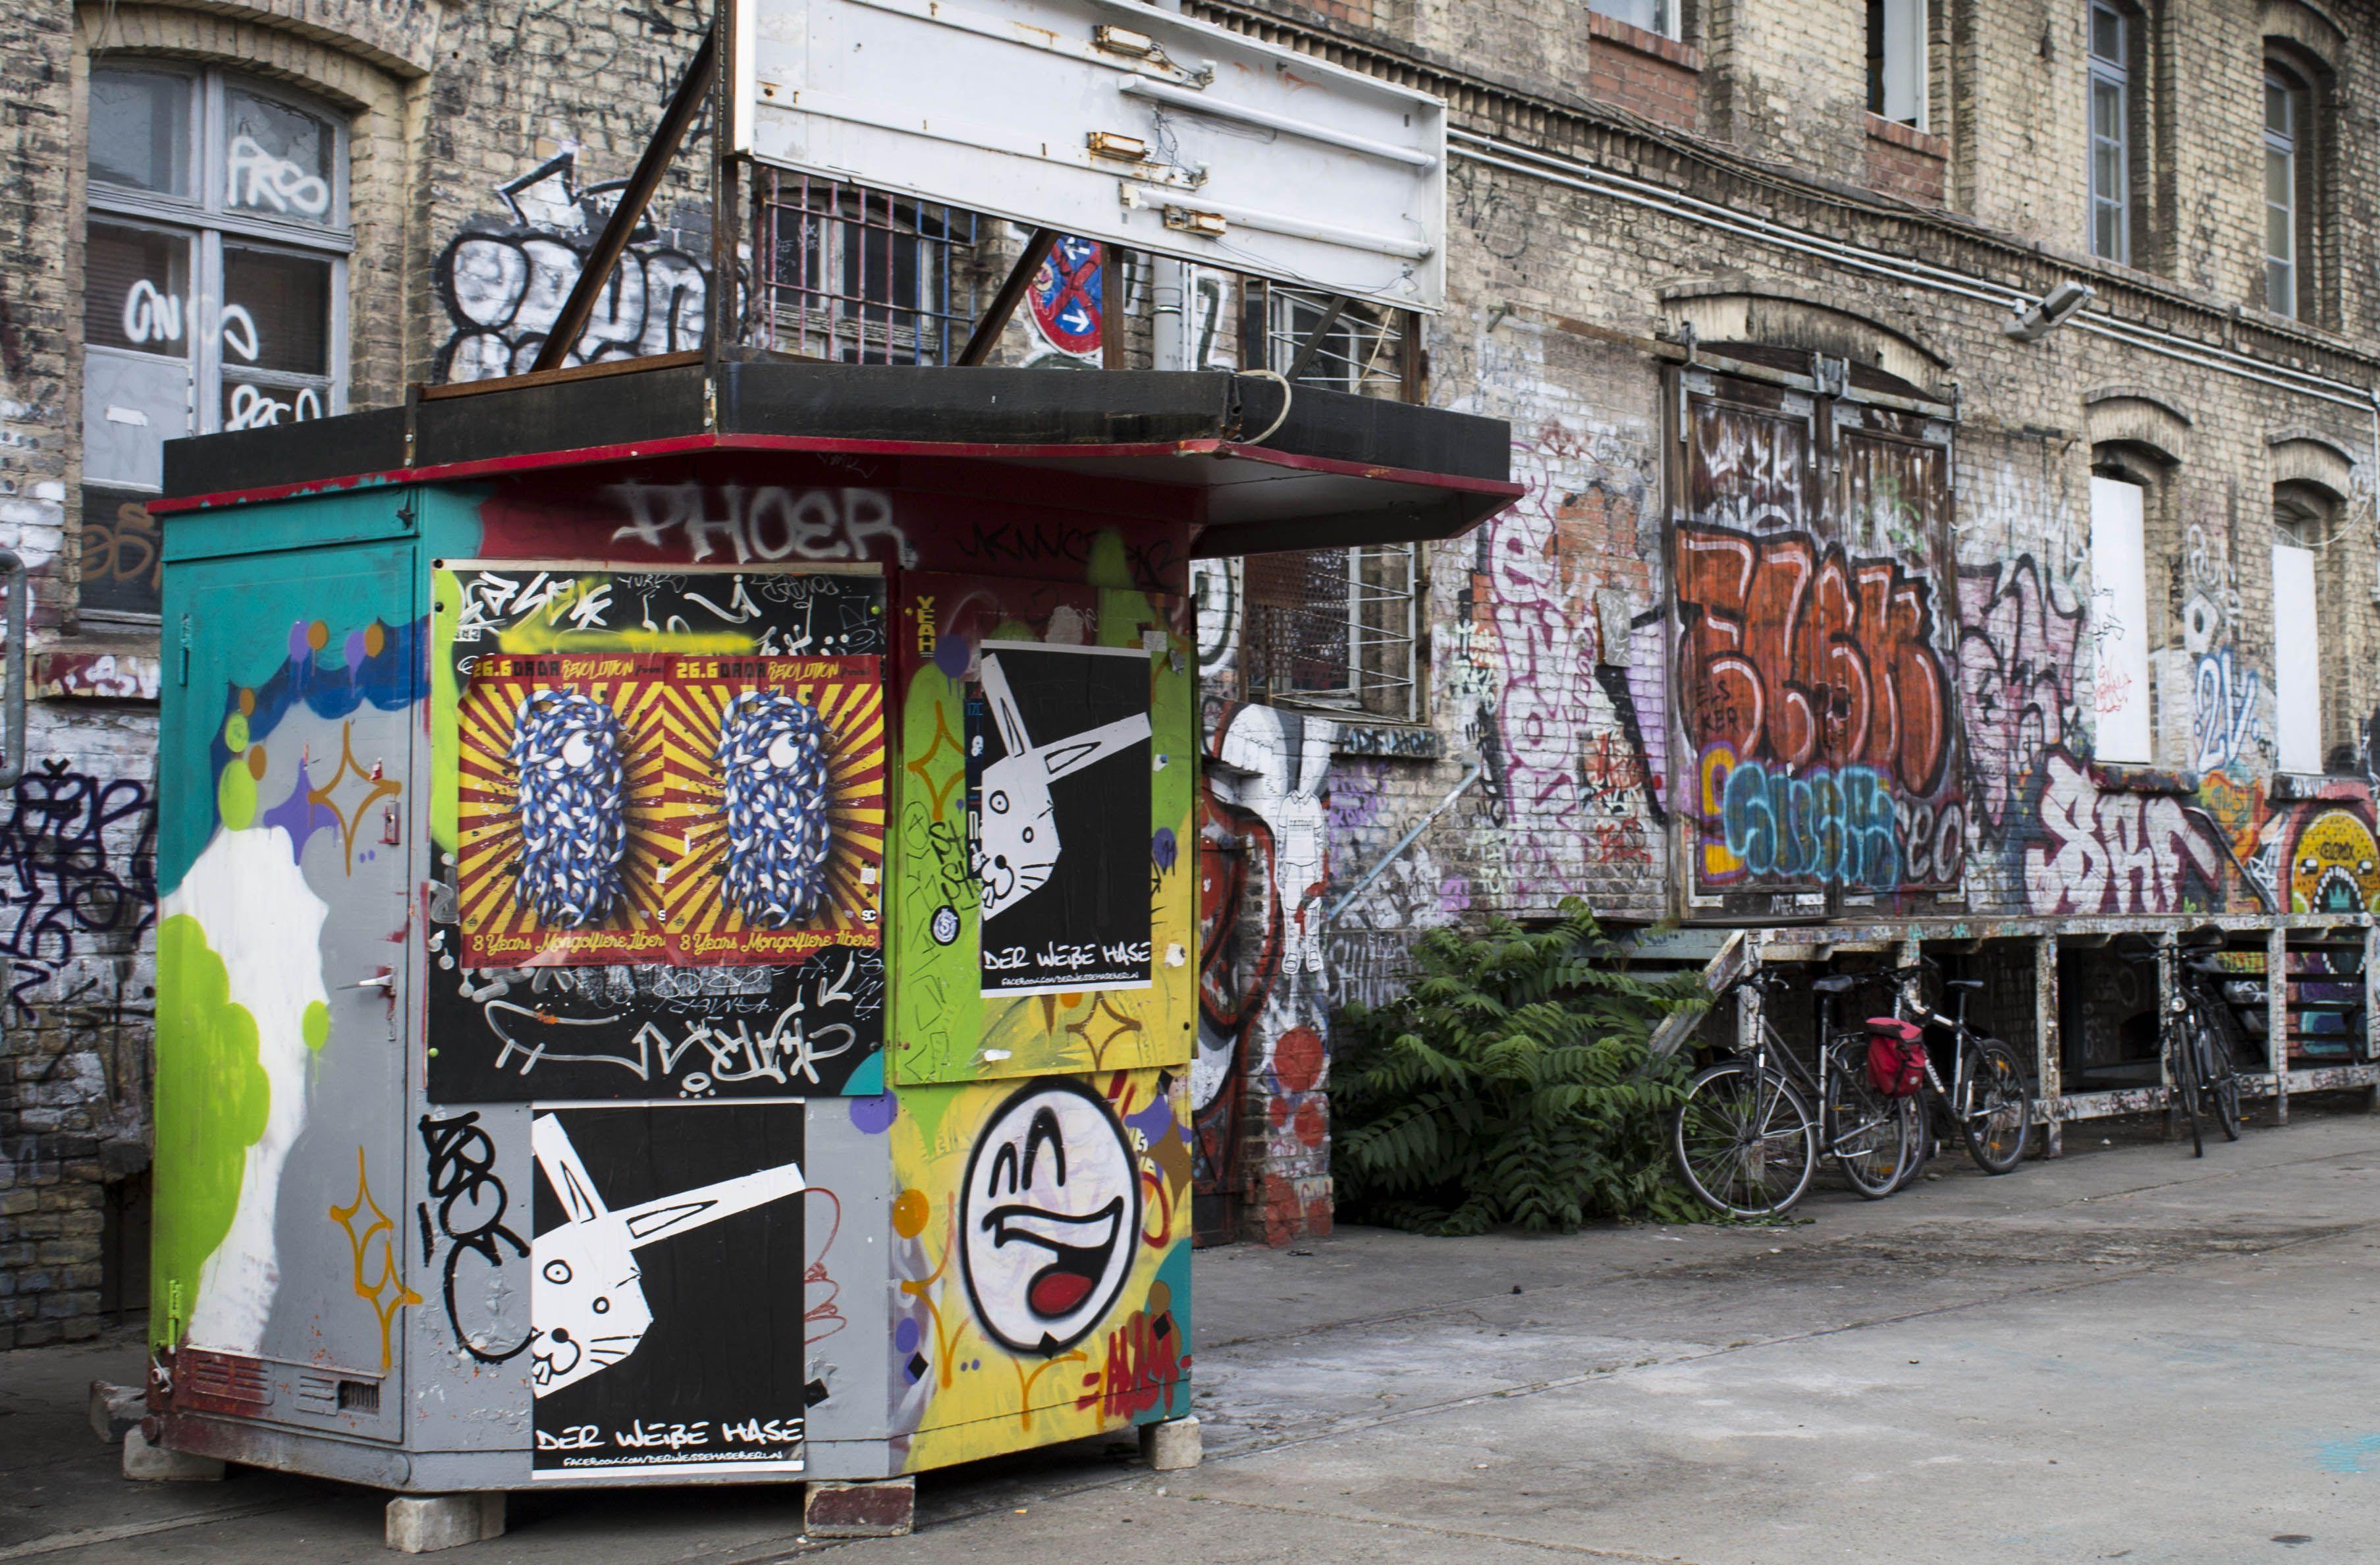 Street Art Berlin Streetart Art Graffiti Streetarteverywhere Streetphotography Streetartberlin Urban Streetartistry Urbanwalls Wall Graffiti Galpones